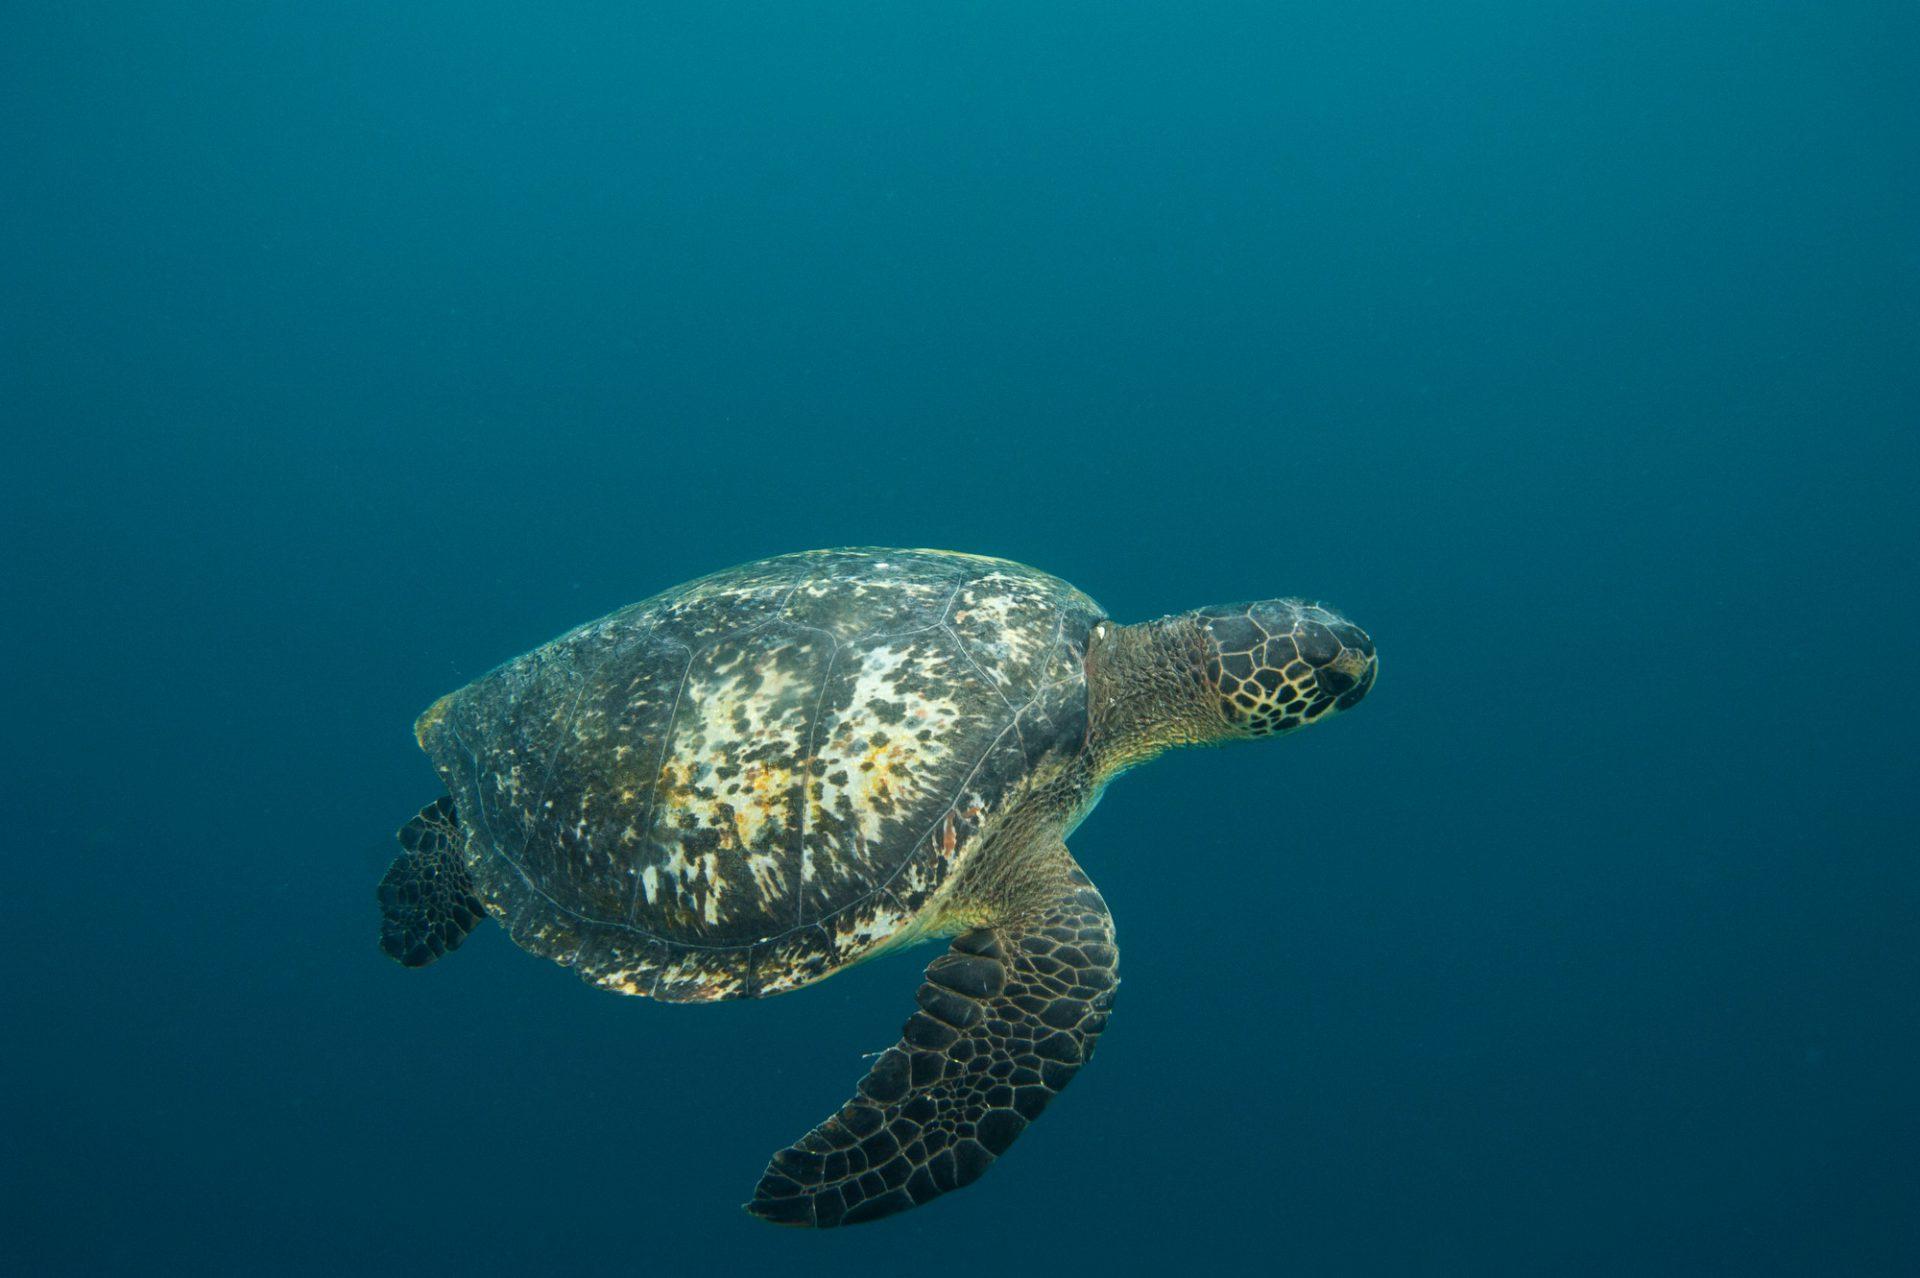 An endangered, (IUCN) and federally endangered green sea turtle (Chelonia mydas) around 'Kicker Rocks' on the edge of San Cristobal Island.